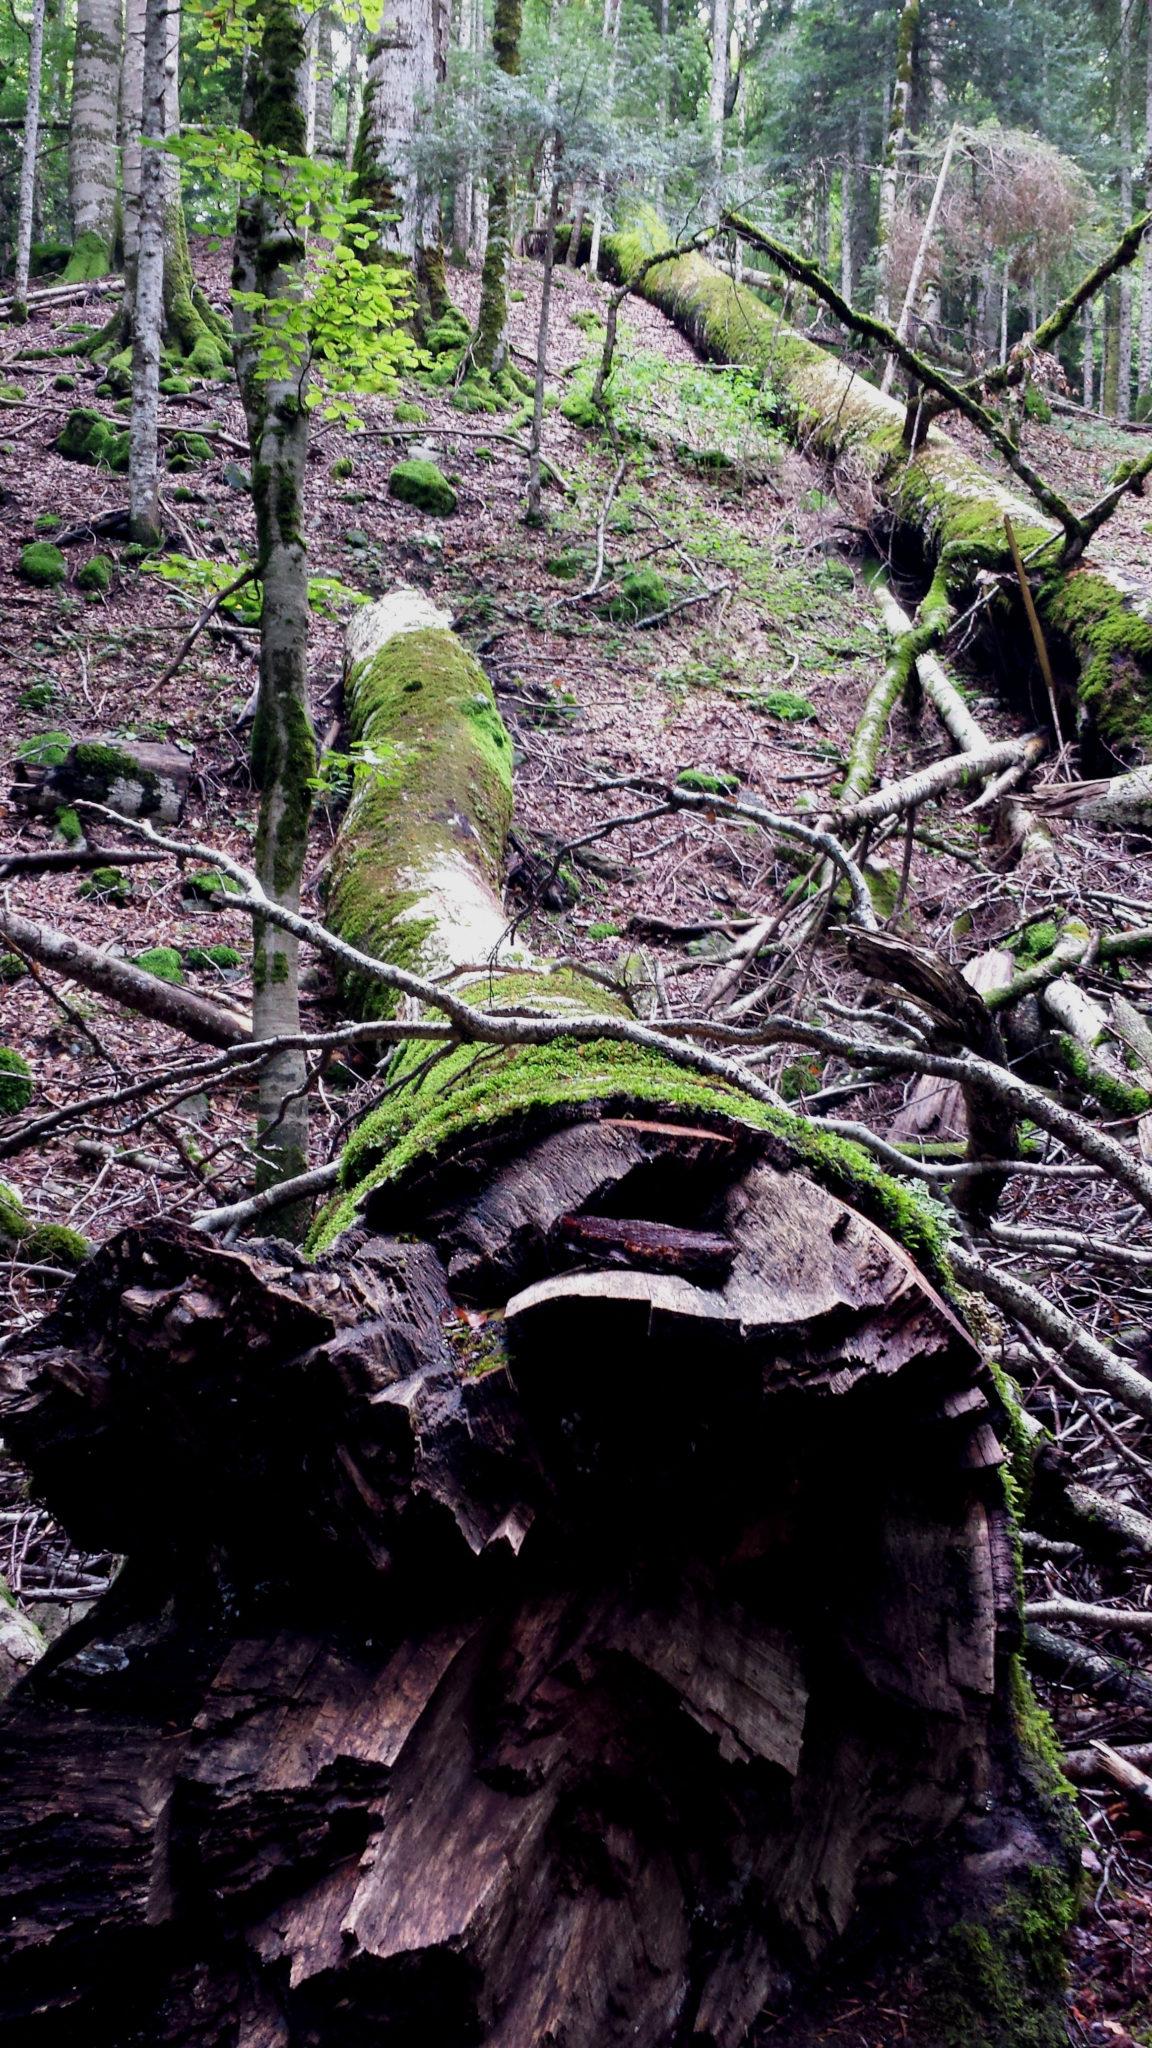 Hema_Montenegro_parc_national_biogradska_gora_forest_travel_voyage_blog12